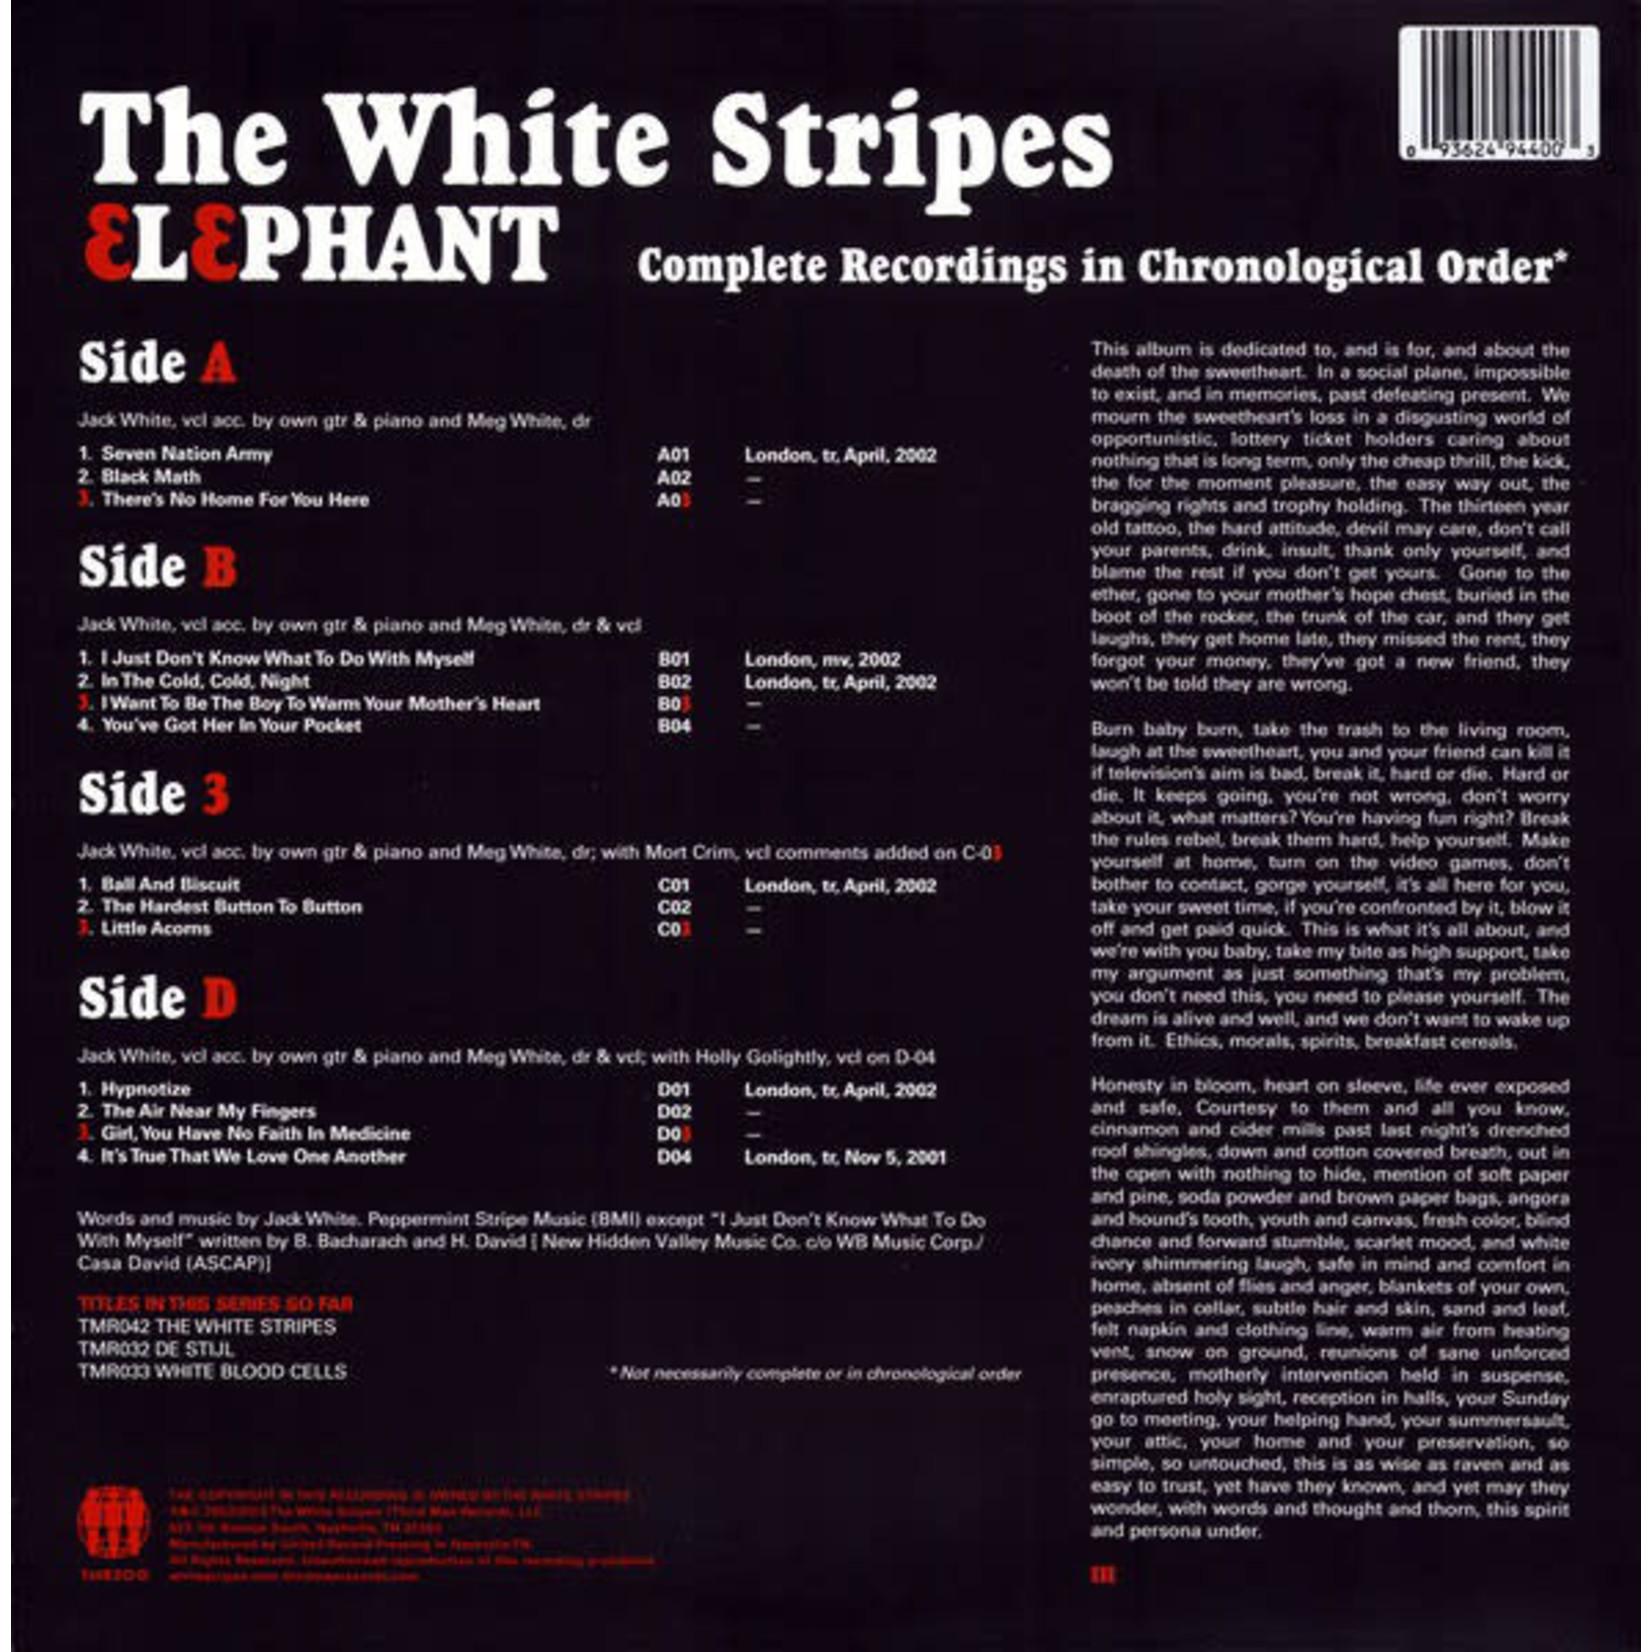 THE WHITE STRIPES ELEPHANT (VINYL)